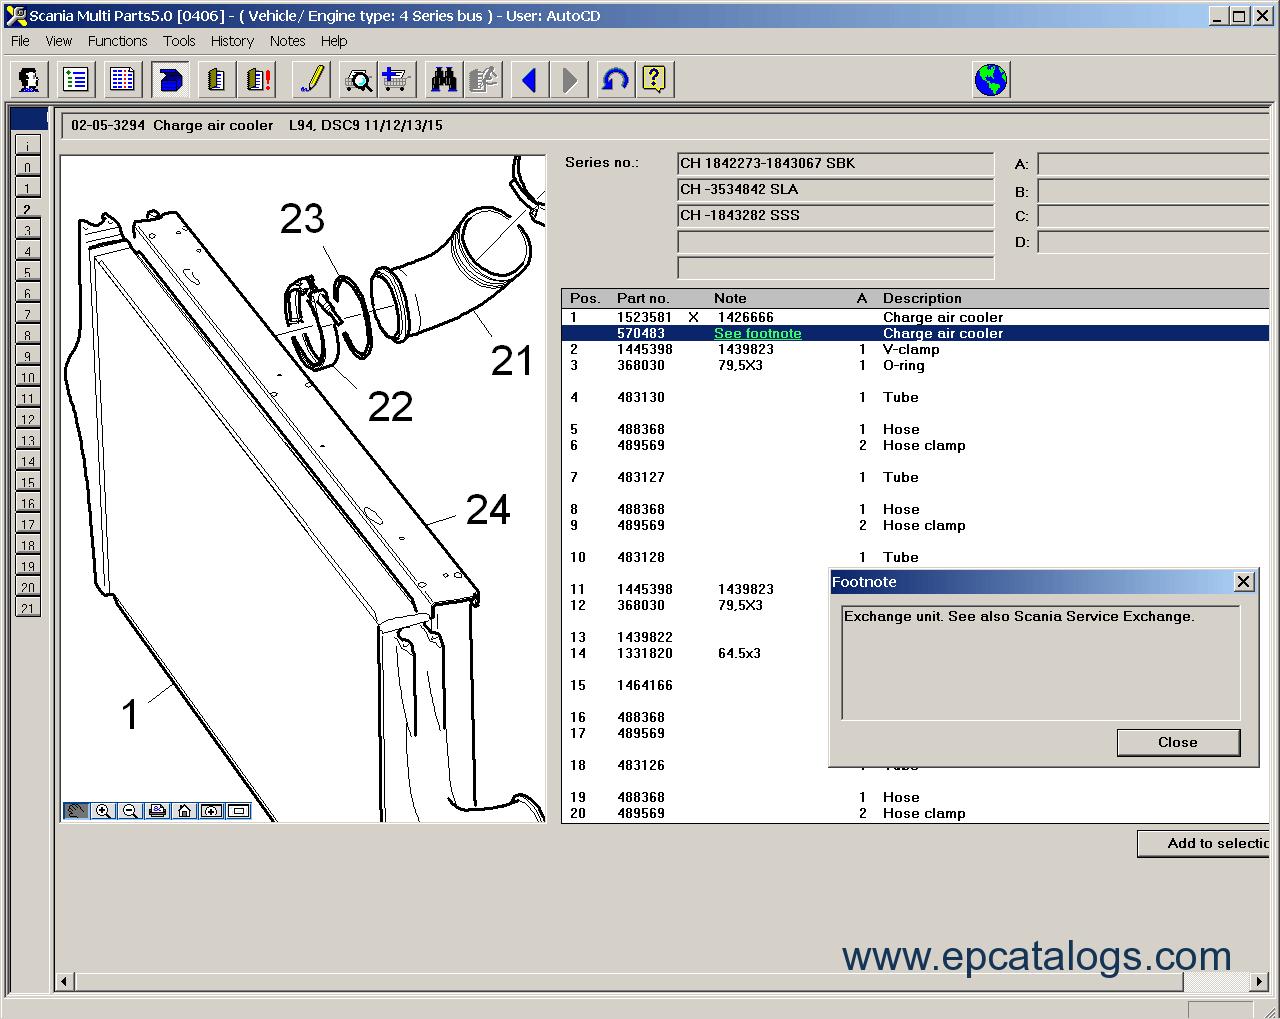 Enlarge spare parts catalog scania multi 2012 4 enlarge